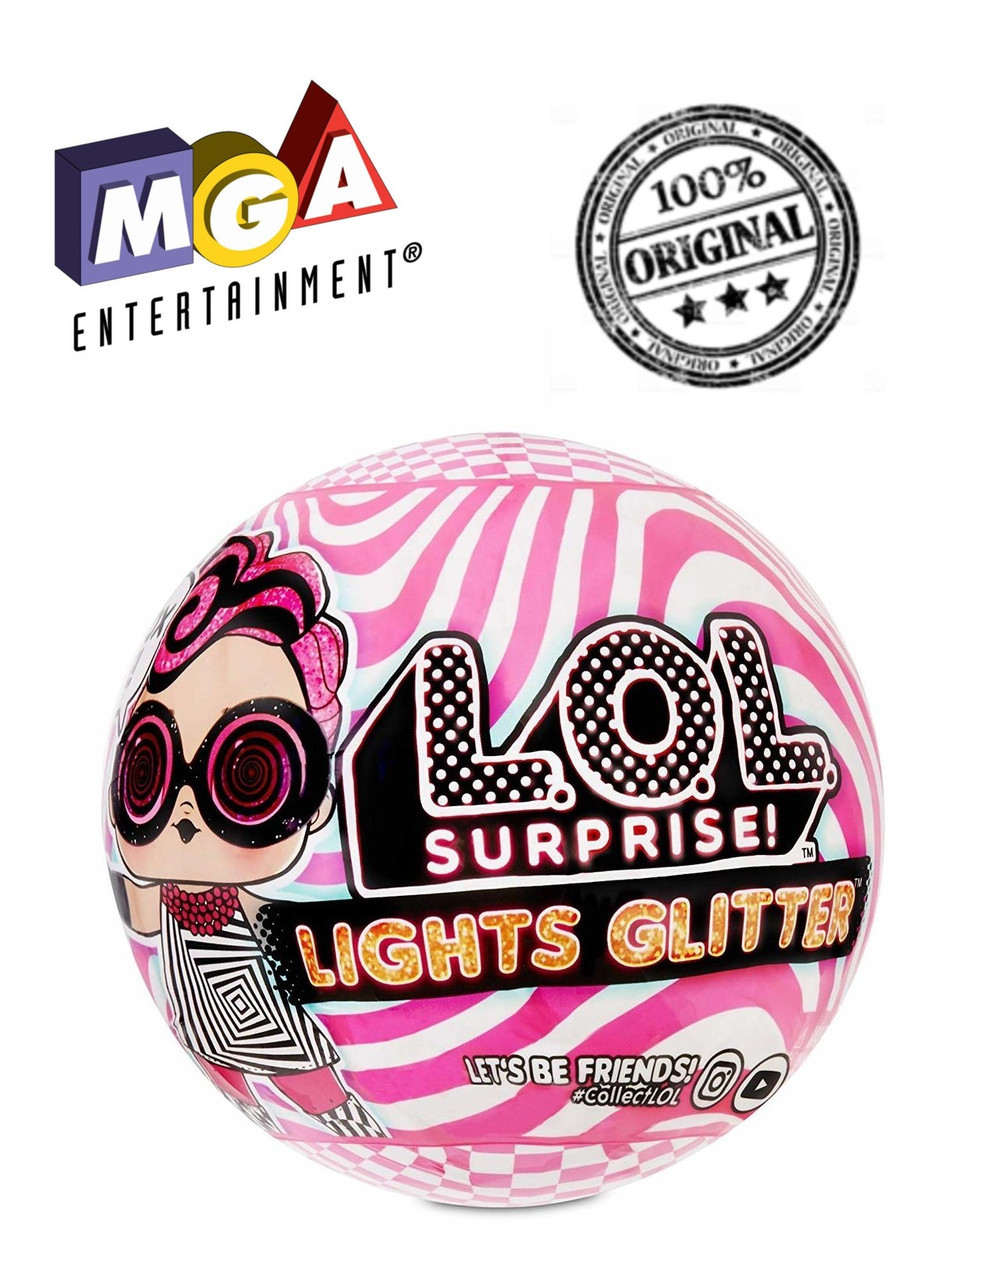 LOL Surprise - Светящаяся Кукла ЛОЛ Сюрприз в шарике, Неон Блестящая Lights Glitter (Оригинал)